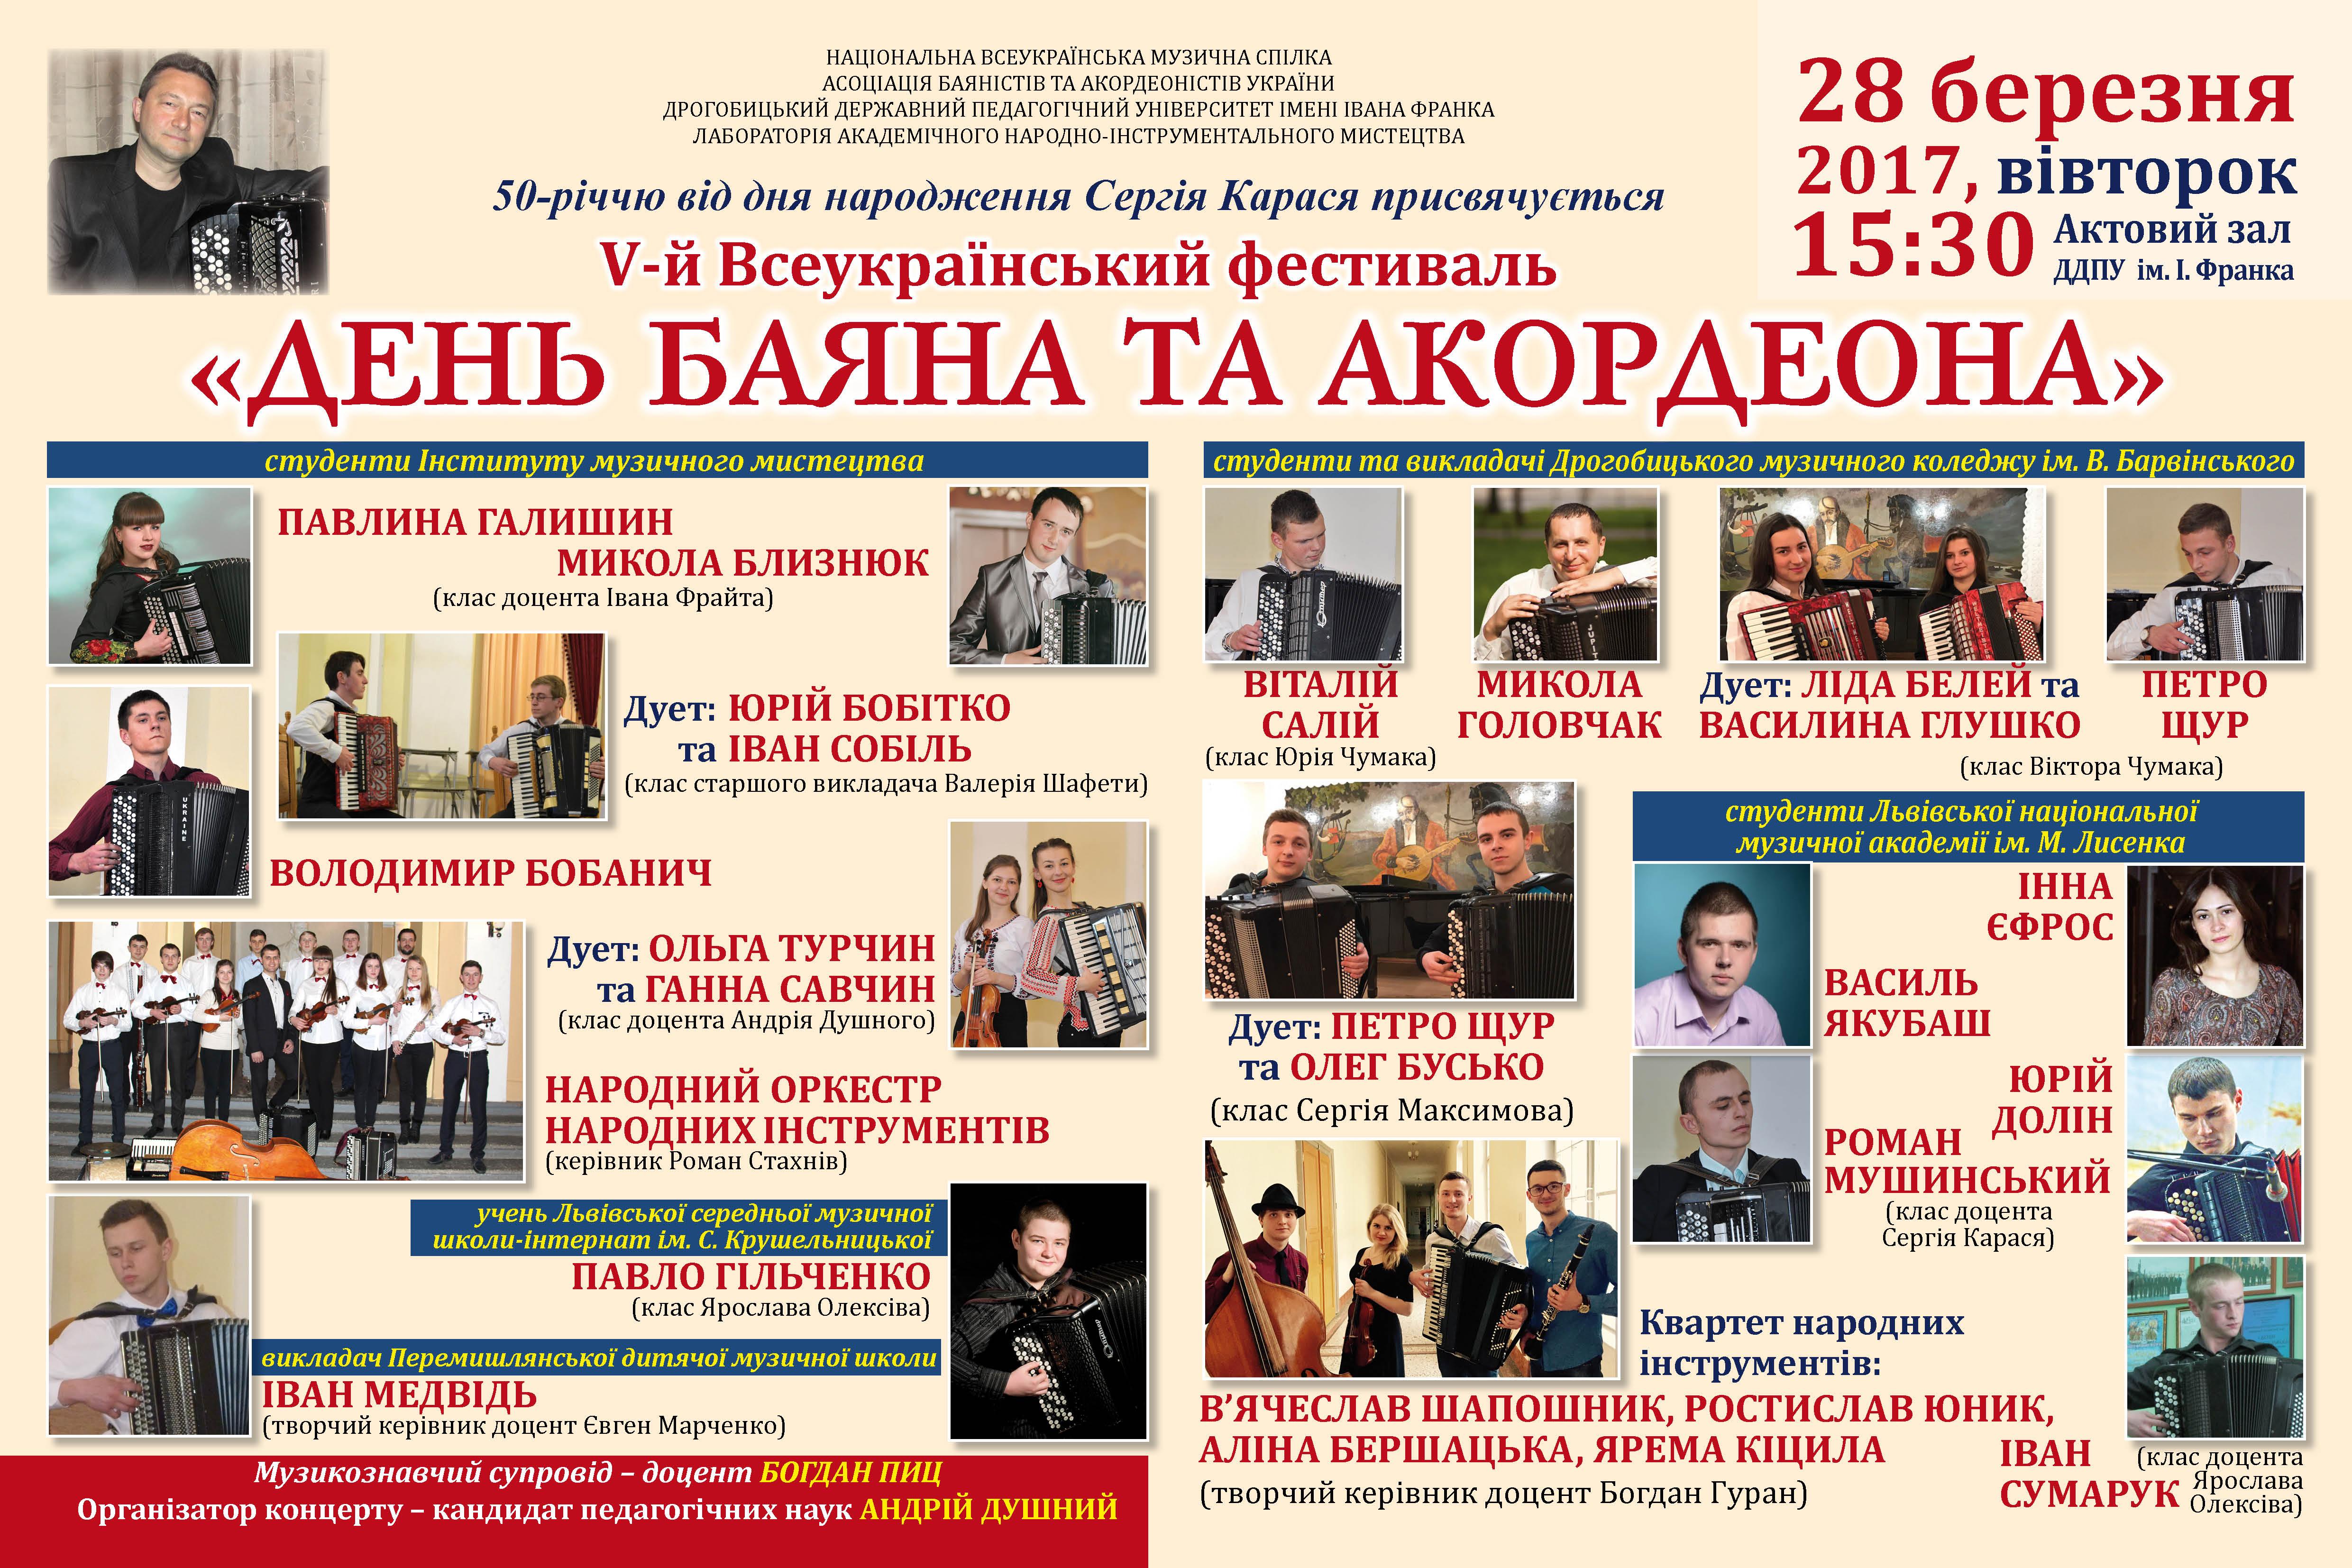 афішка_день баяна (Дрогобич, 28.03.2017)